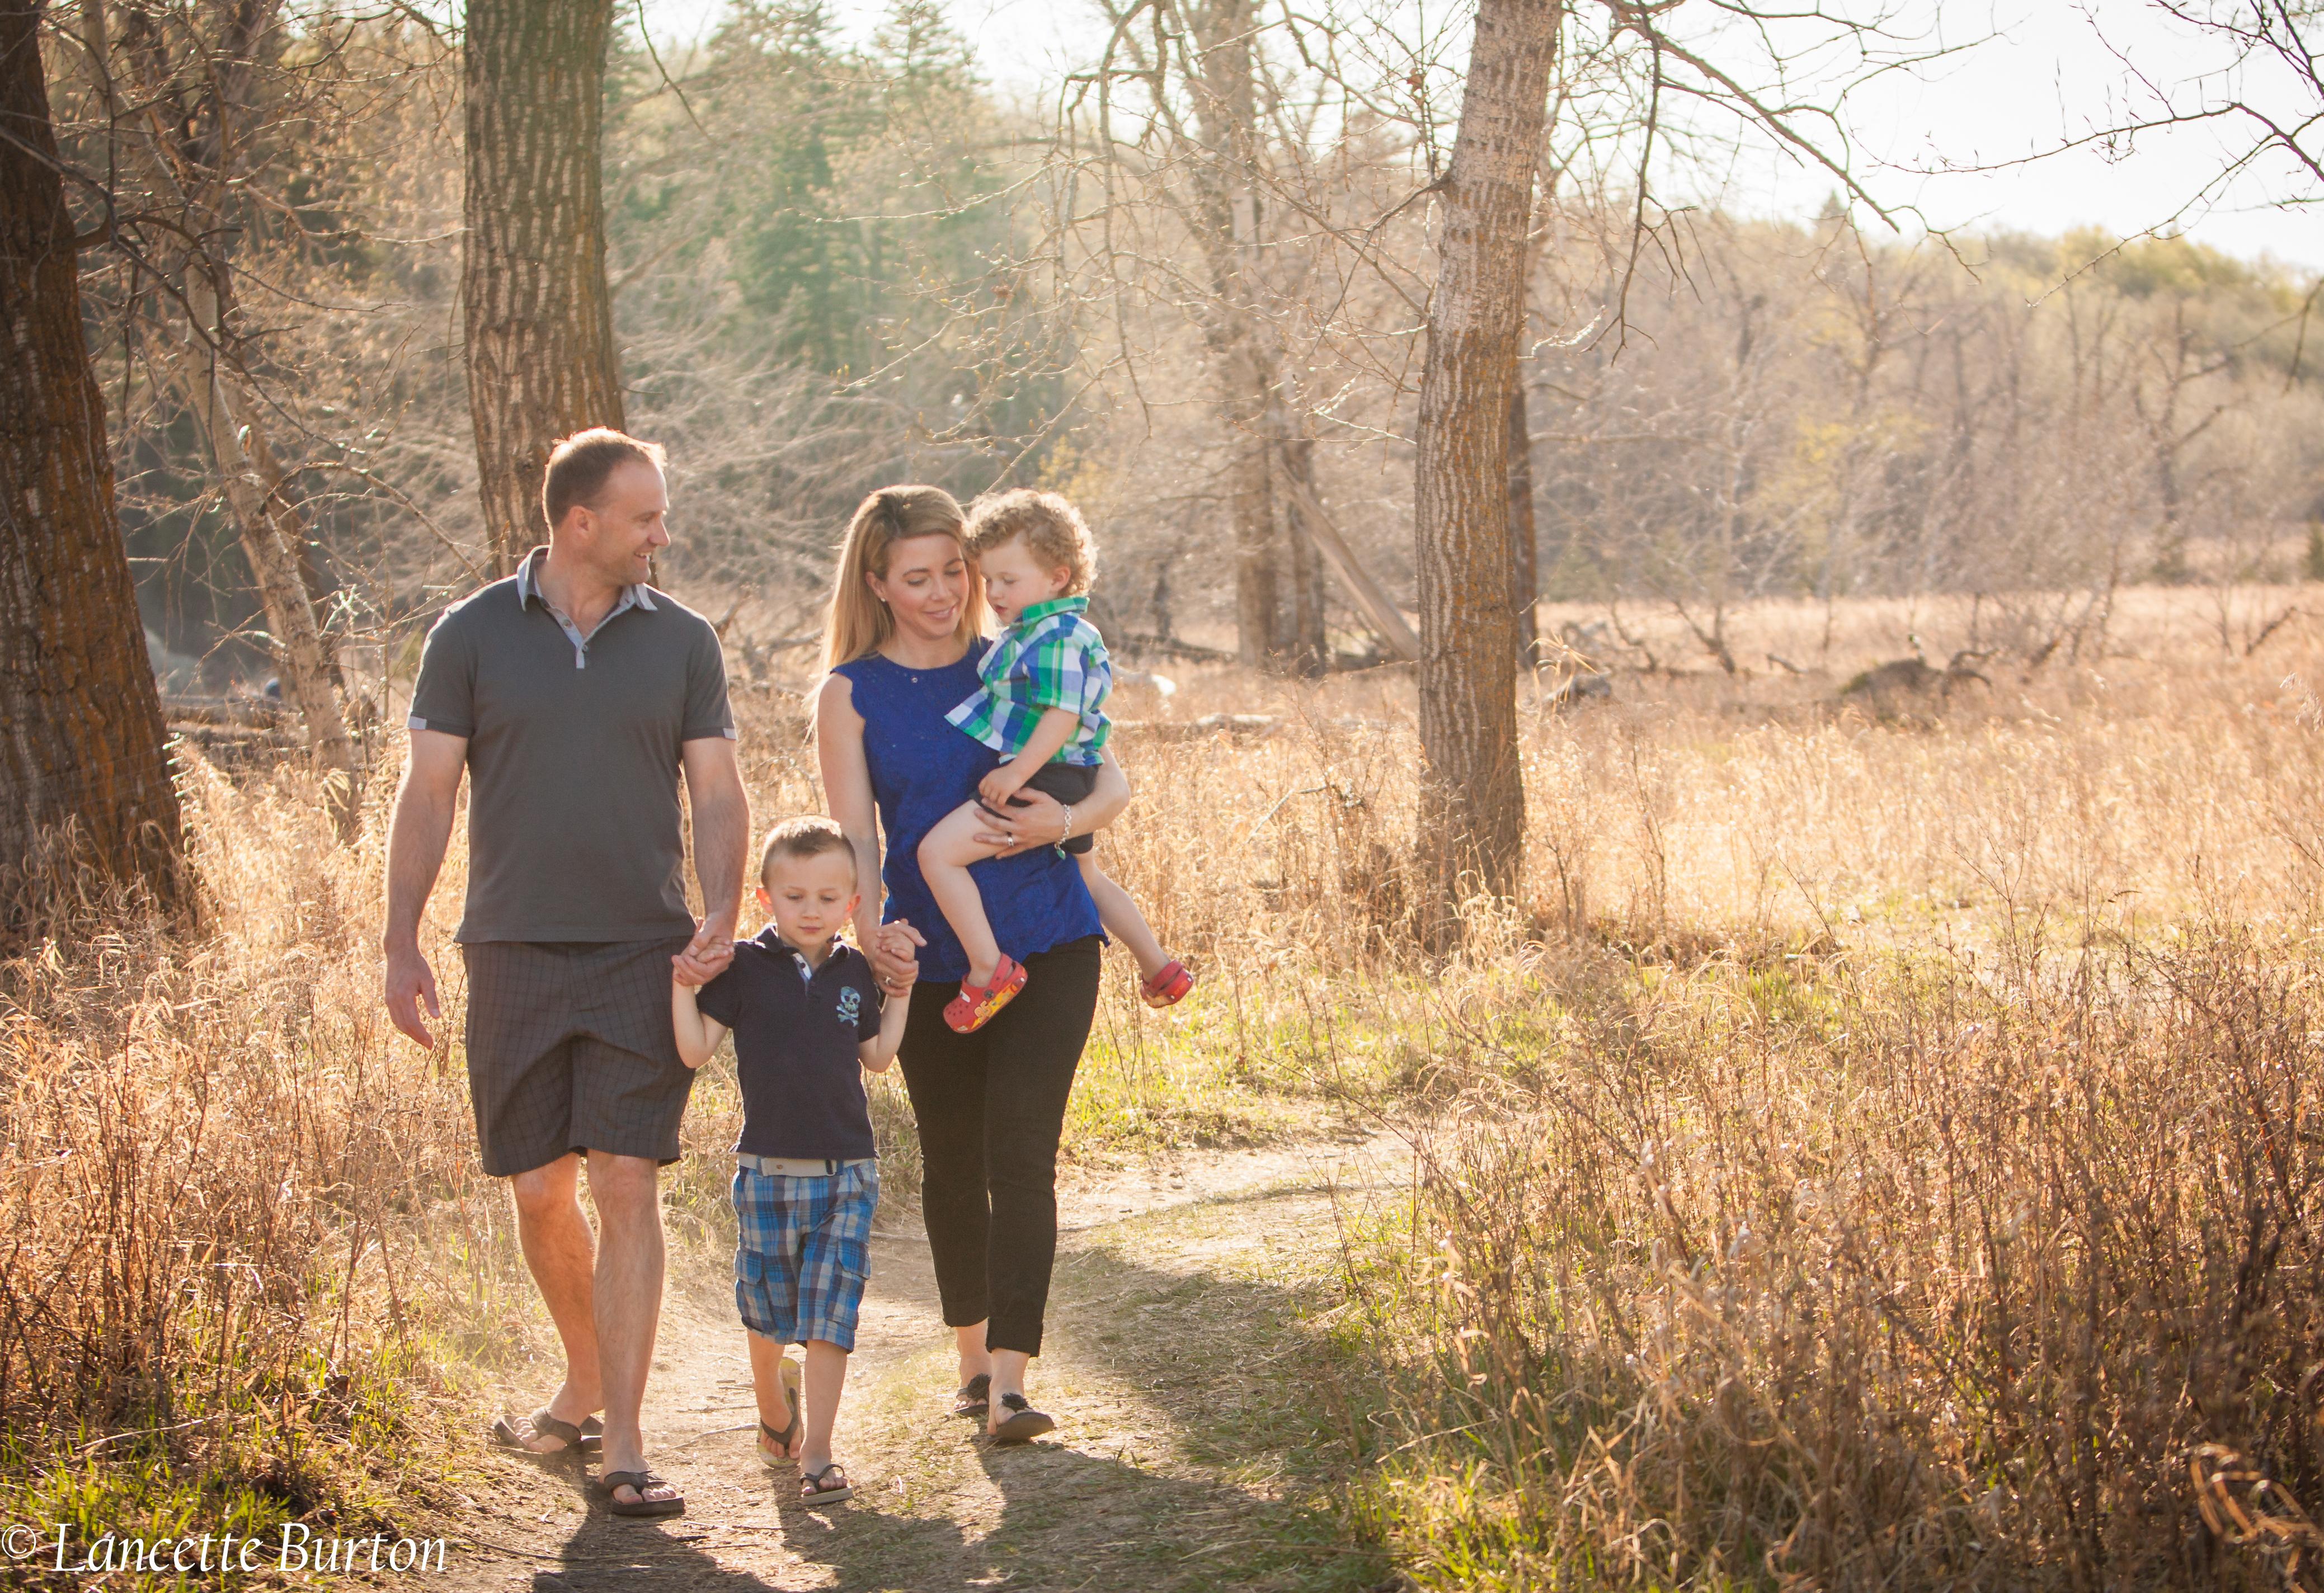 family walking fb (1 of 1)